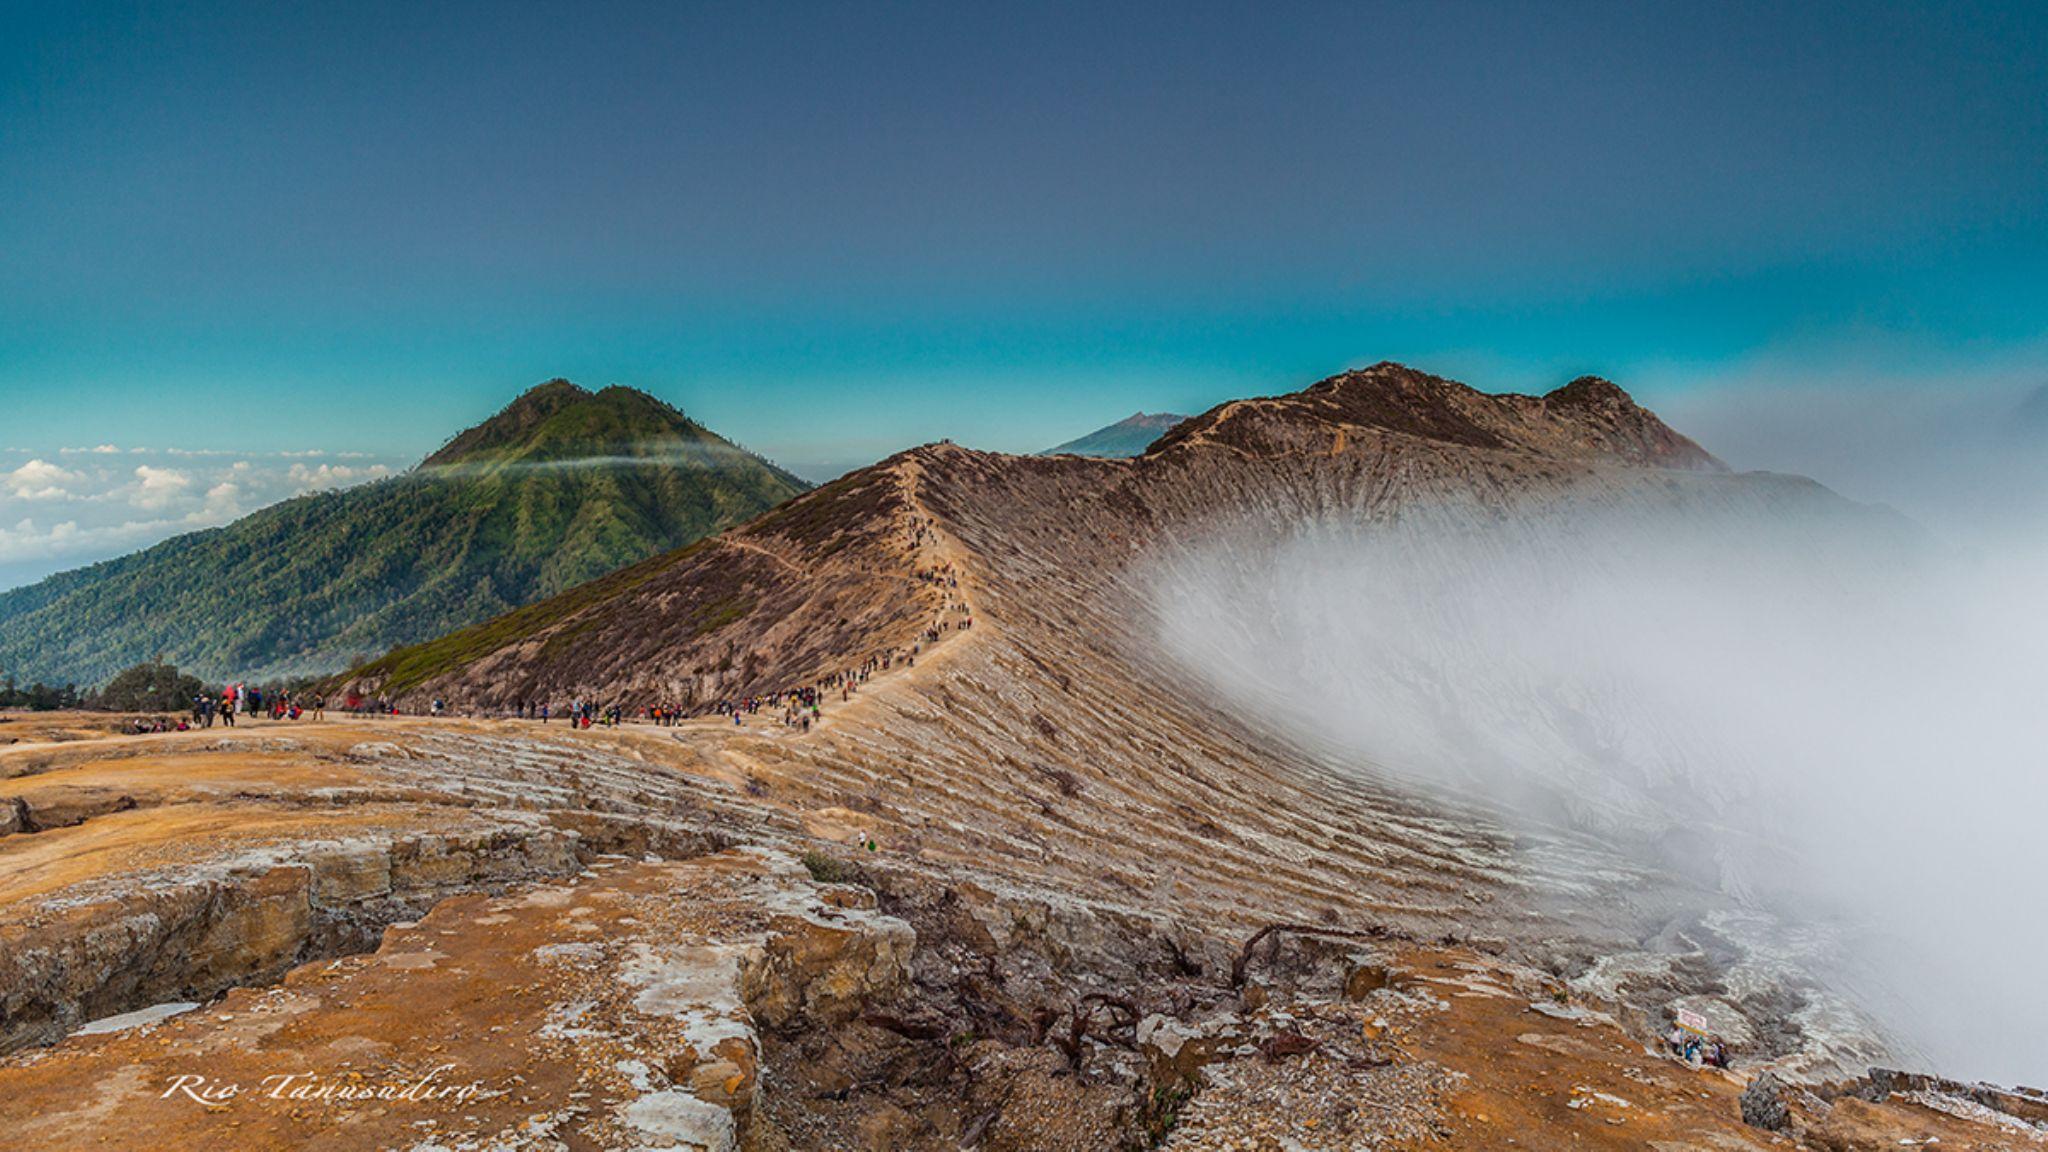 Ijen crater by Rio Tanusudiro